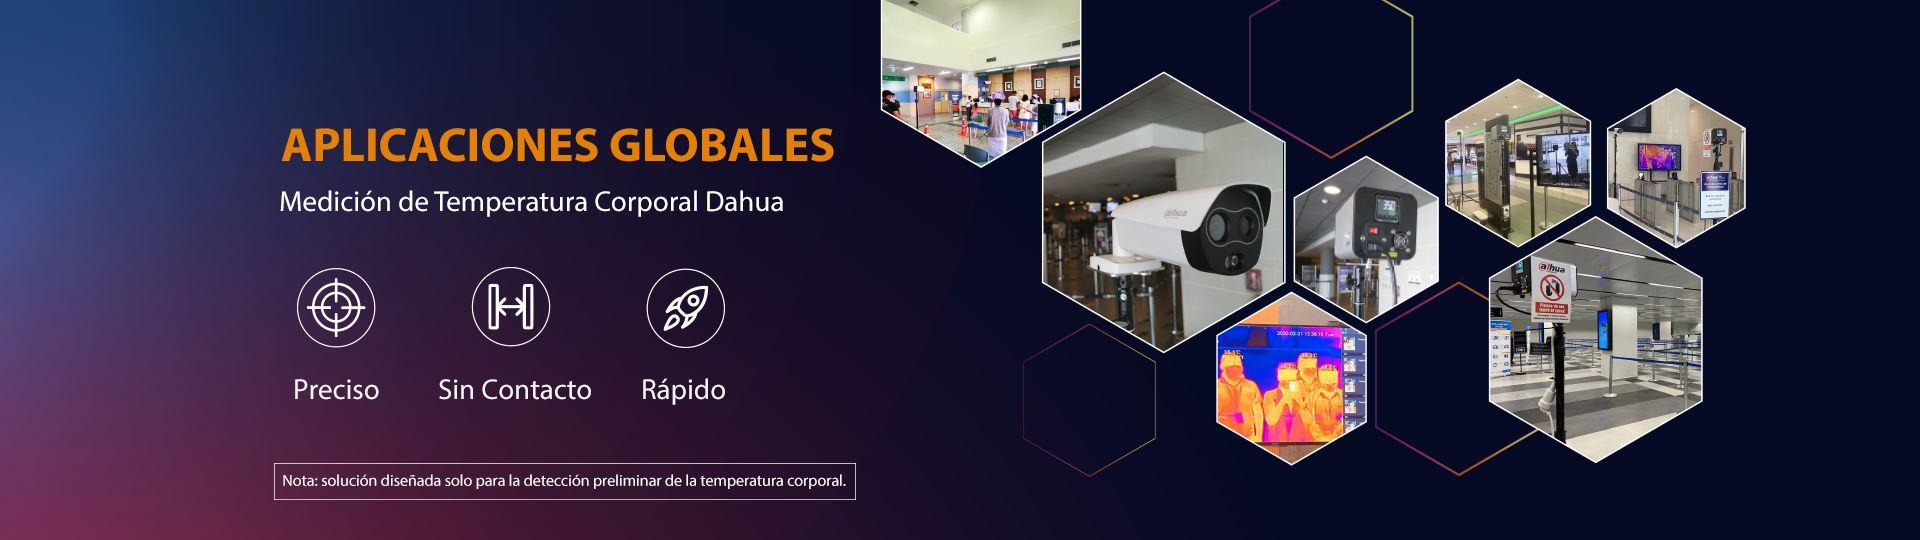 Dahua_aplicacionses_globales